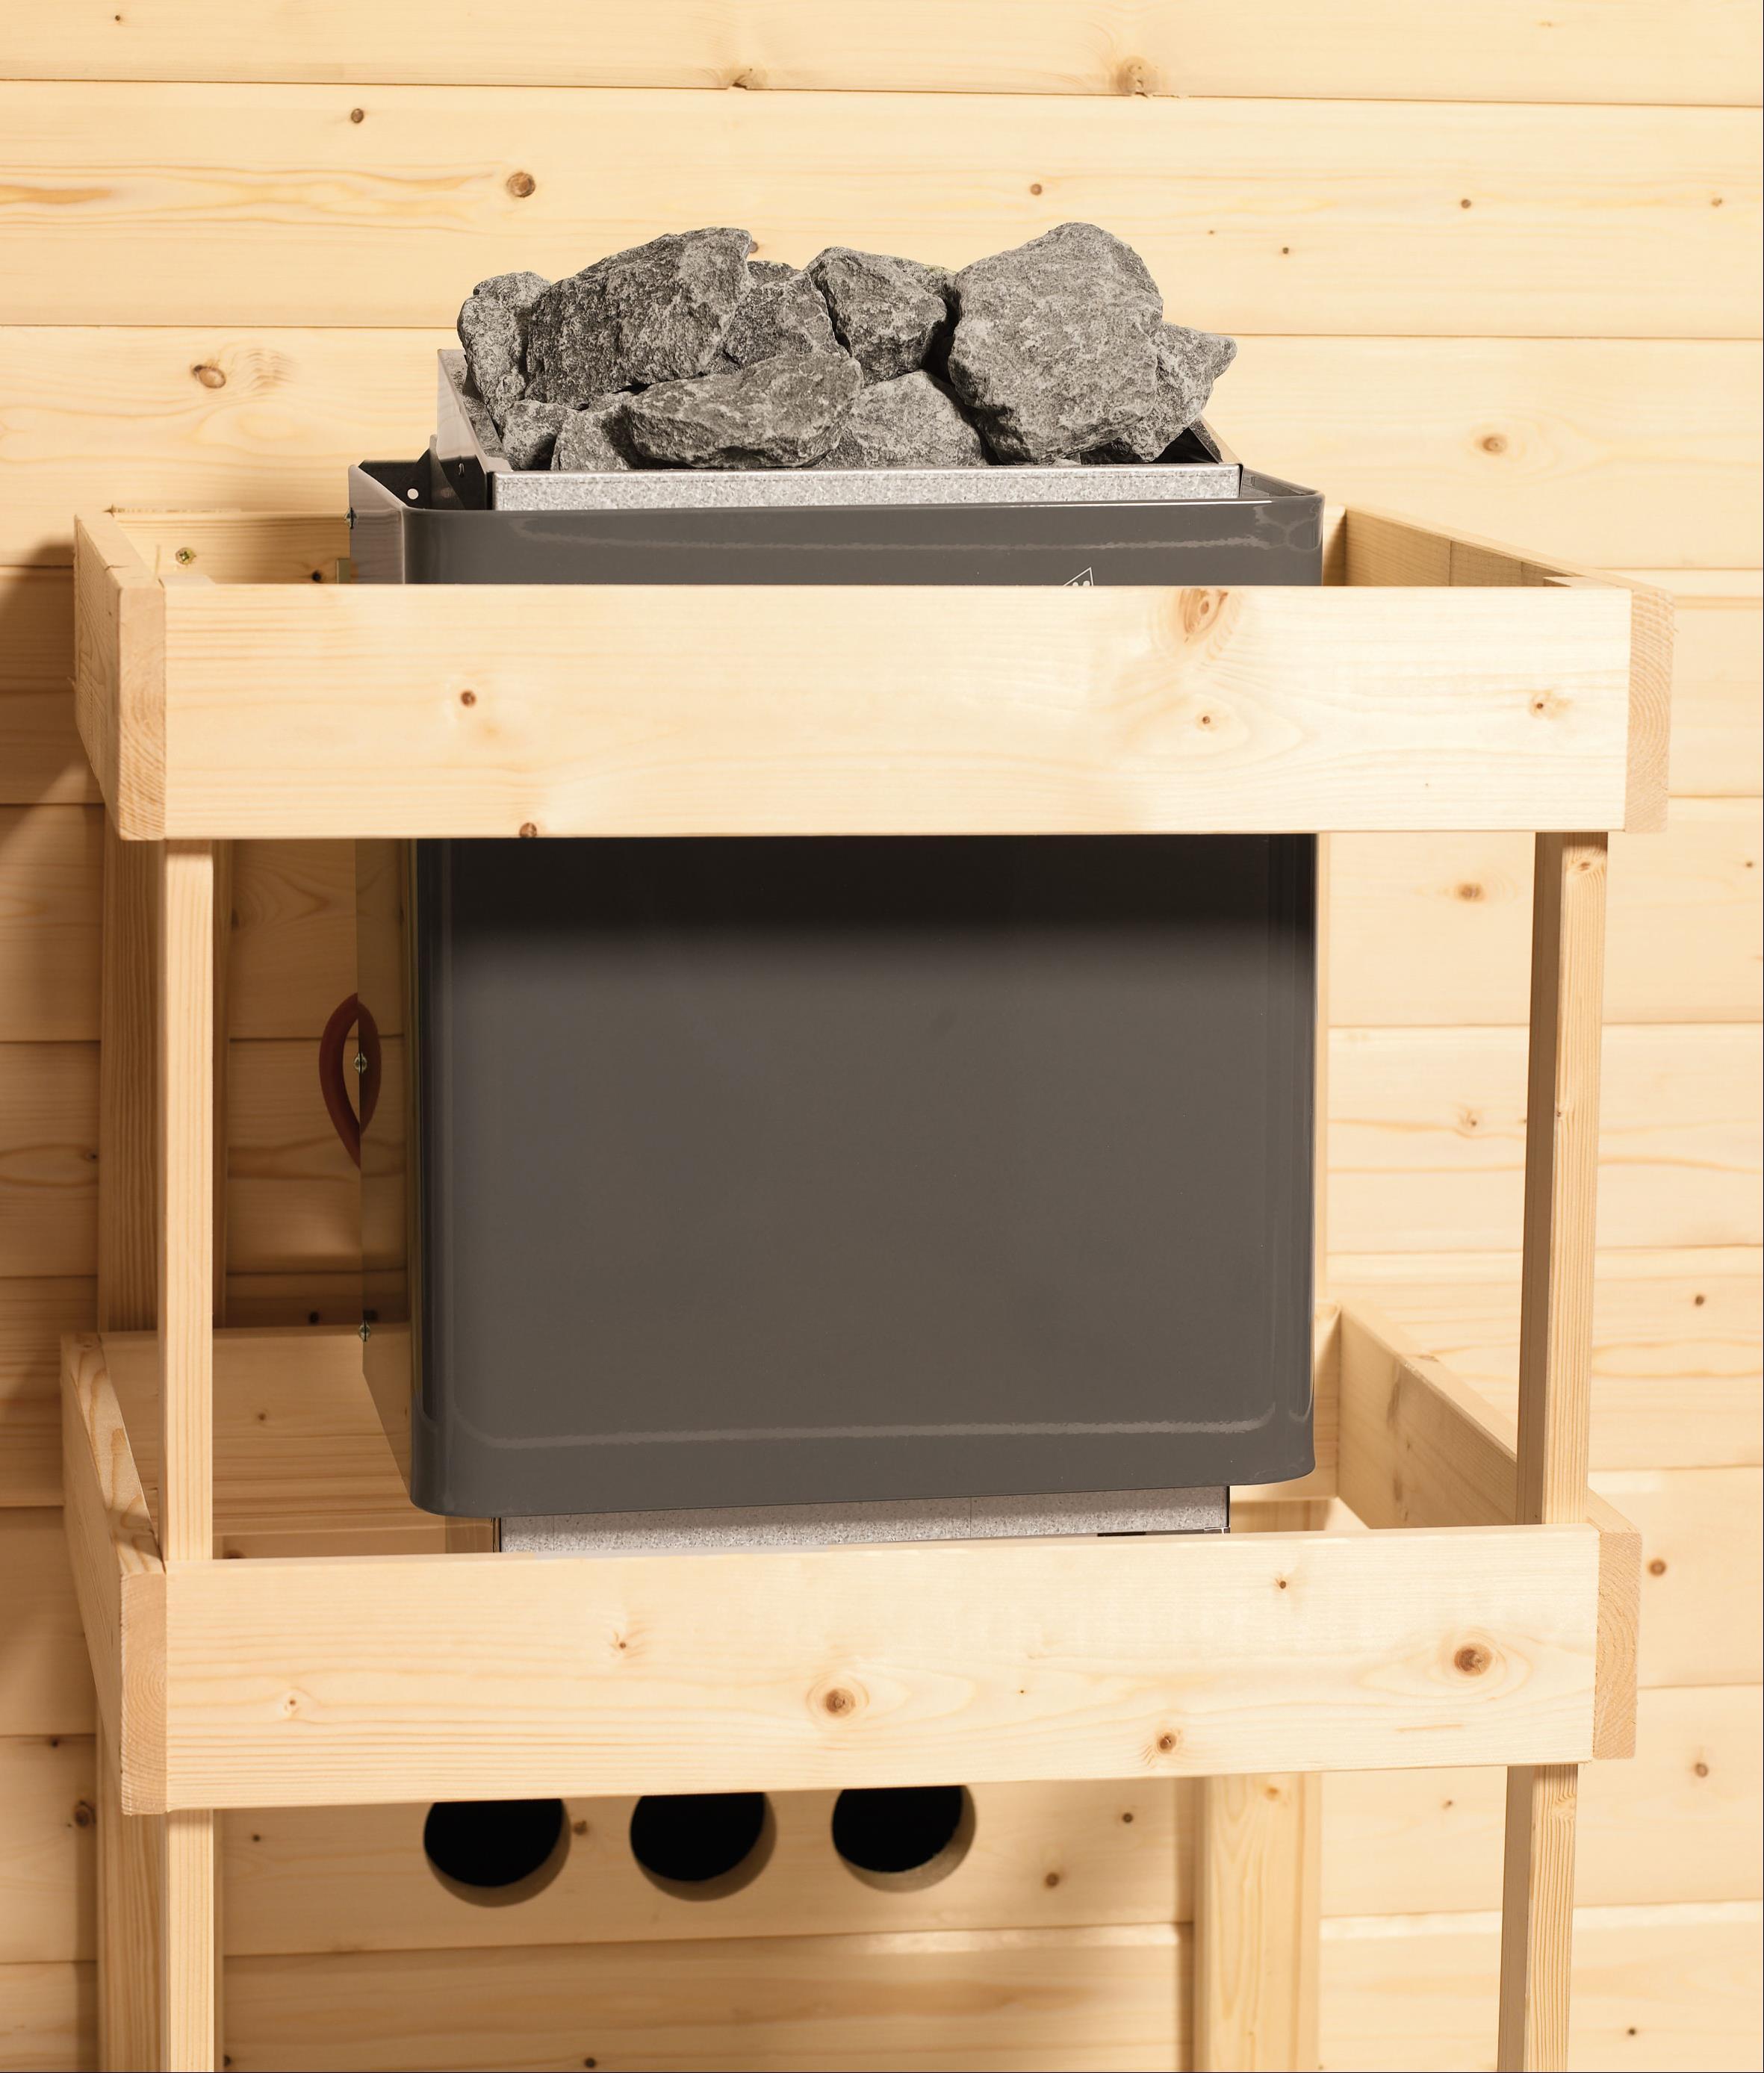 Gartensauna WoodFeeling Saunahaus Pirva 38mm Saunaofen Bio 9kW ext. Bild 8